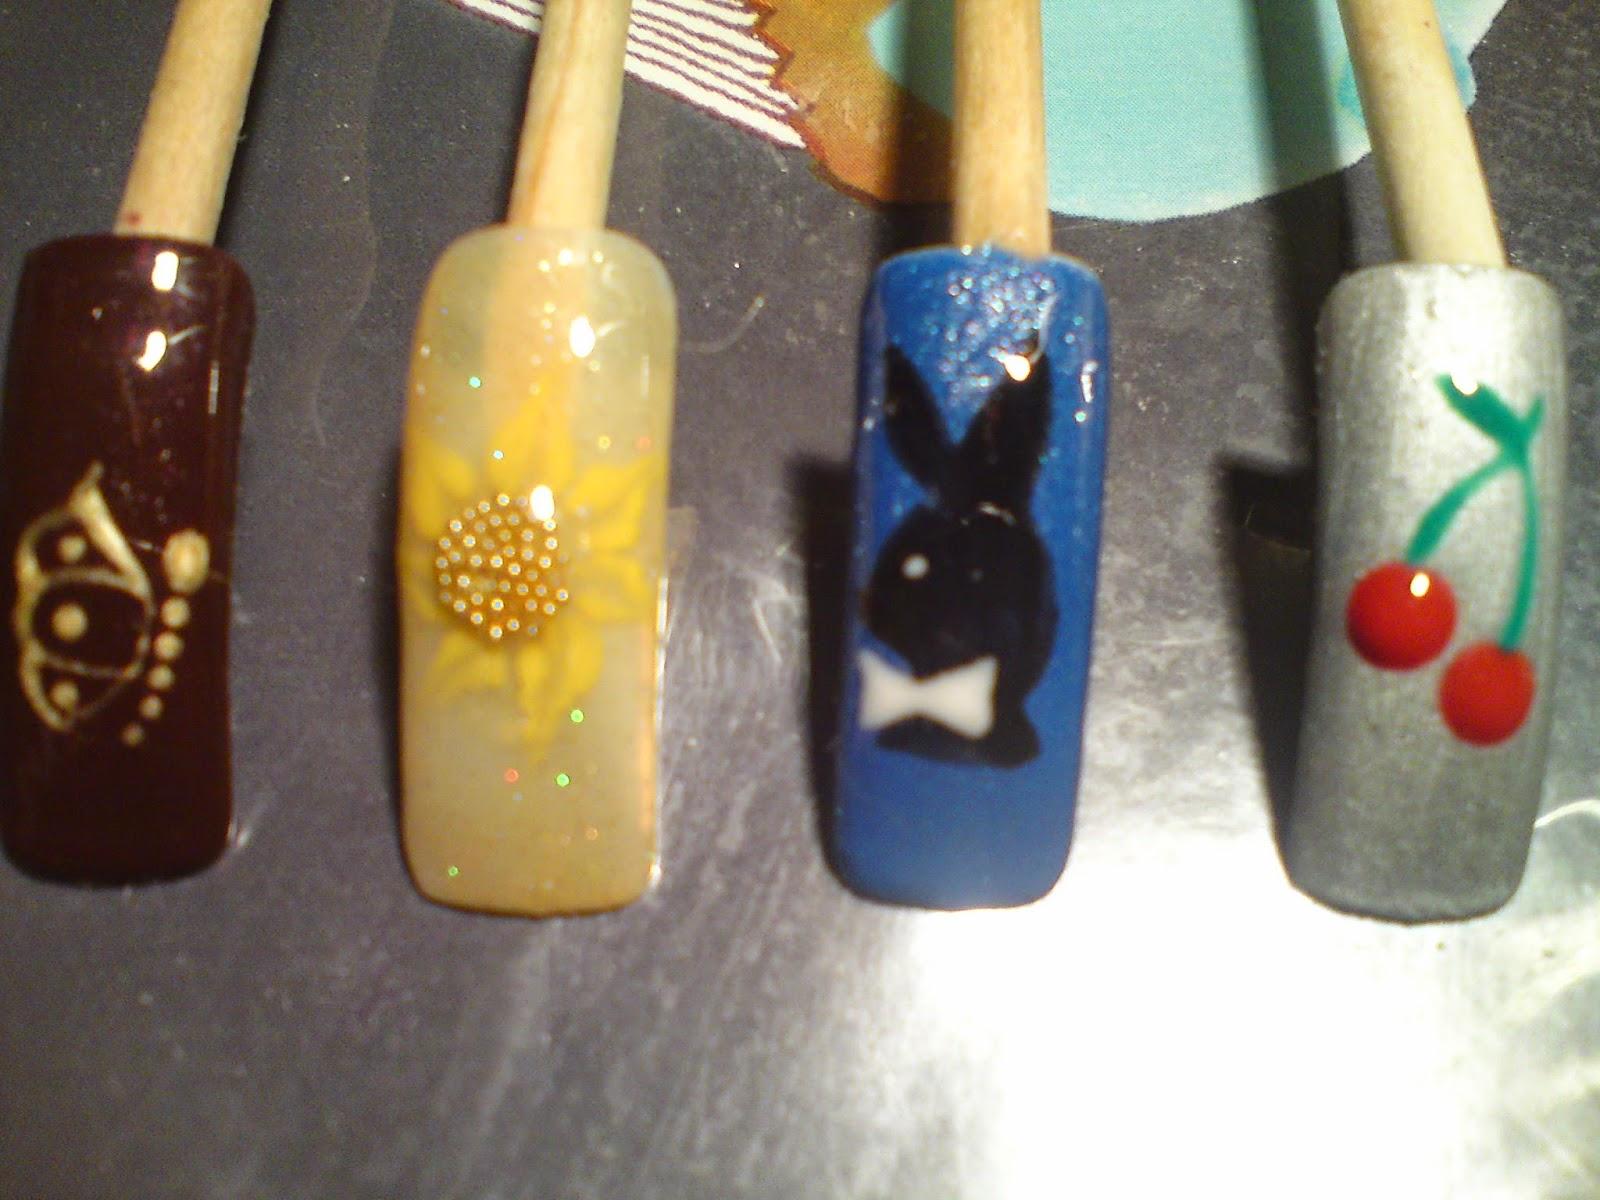 http://lunalithe.blogspot.fr/2011/11/formation-uv-jour-11-nail-art.html